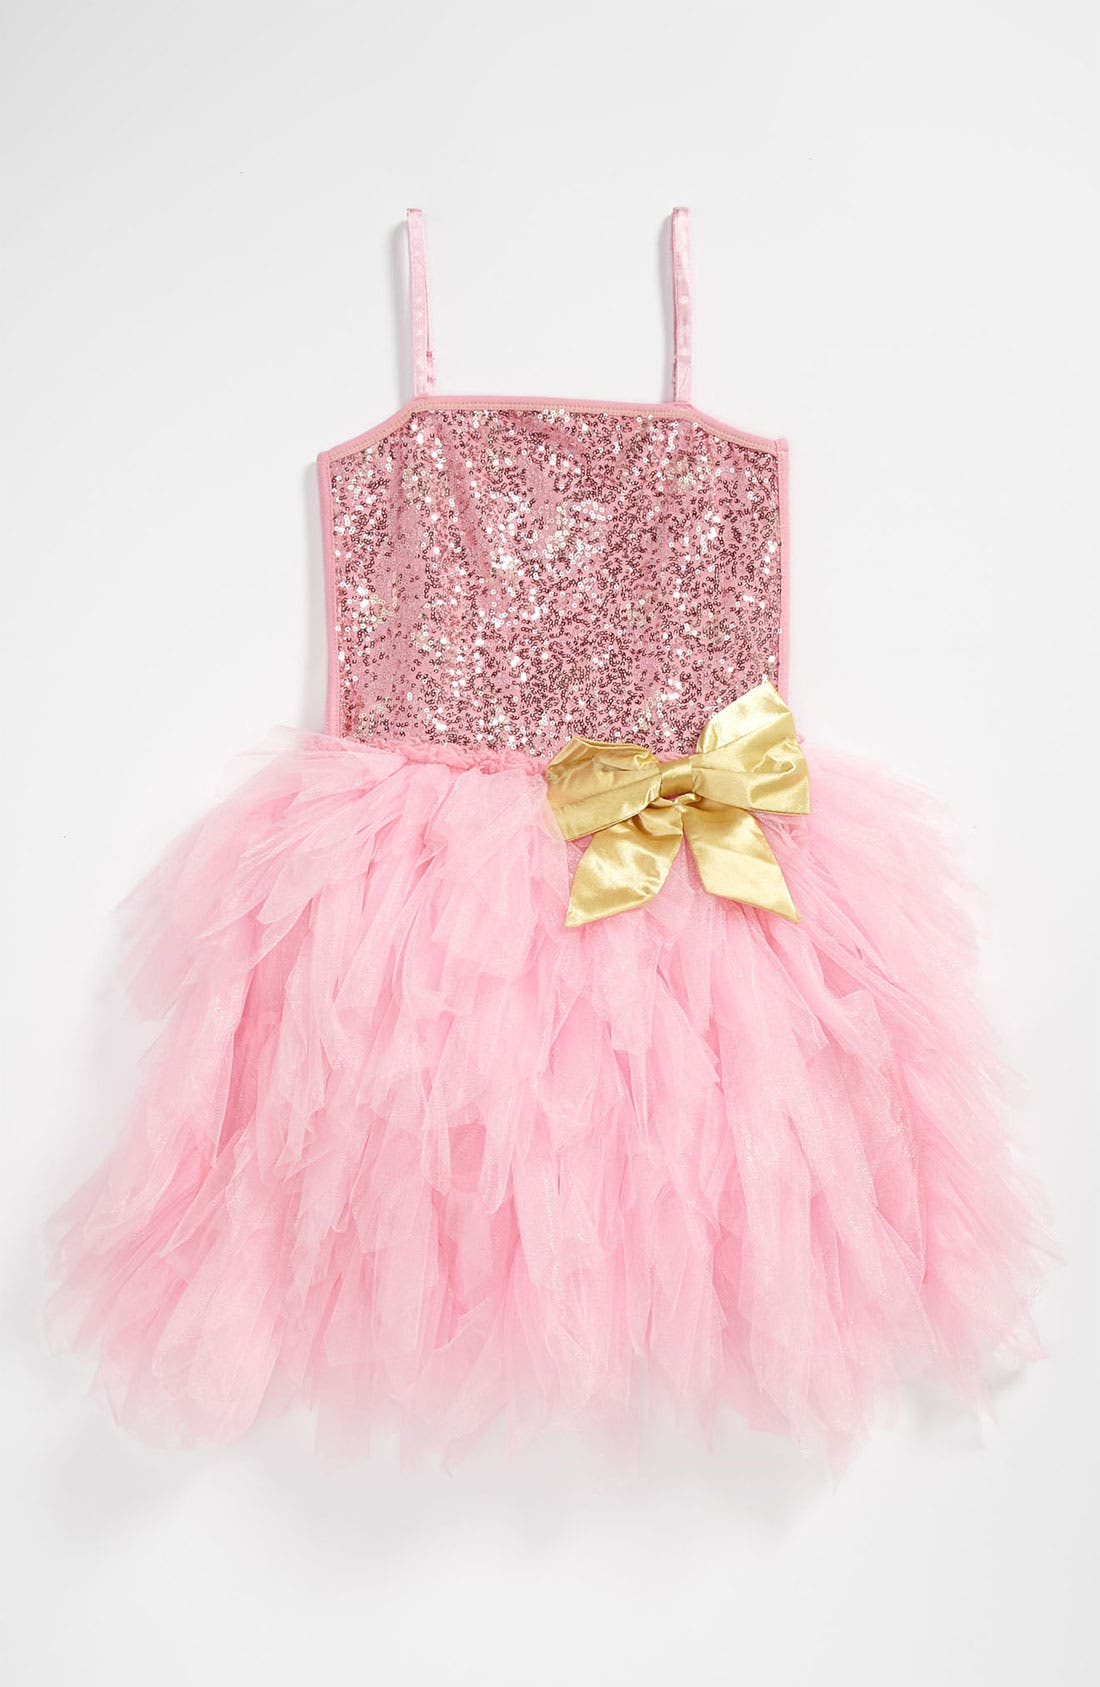 Main Image - Ooh! La, La! Couture 'Wow Emma' Dress (Big Girls)